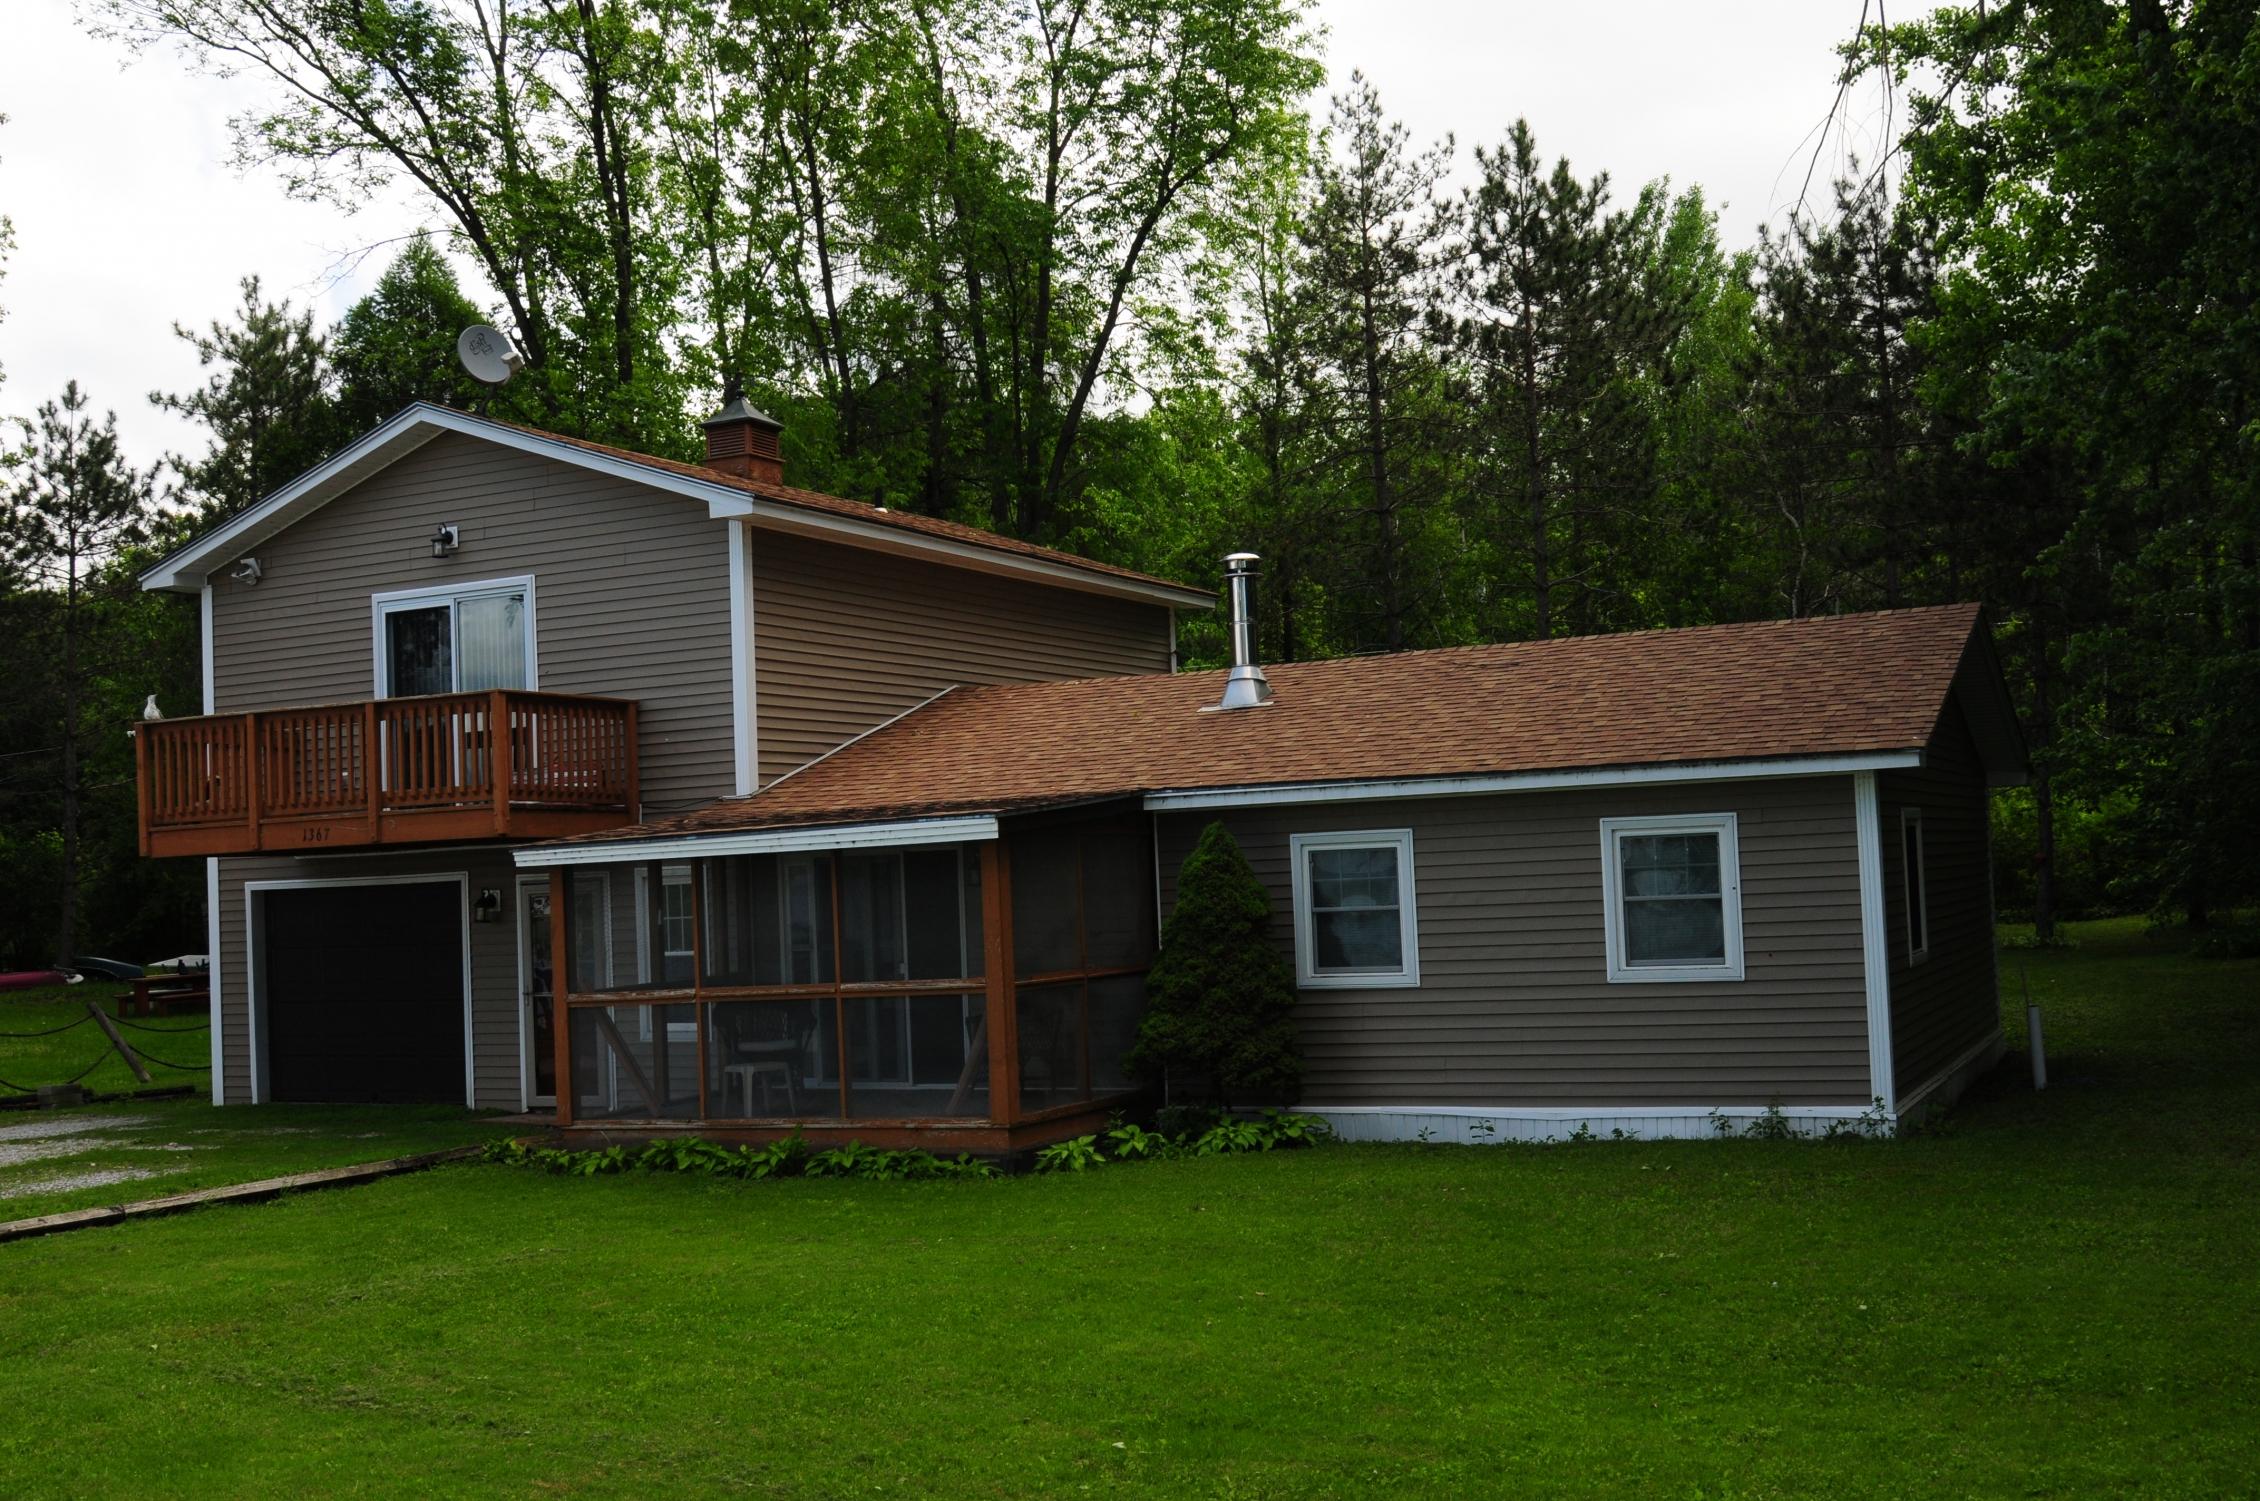 獨棟家庭住宅 為 出售 在 1367 Samson Rd, St. Albans Town St. Albans, 佛蒙特州 05478 美國